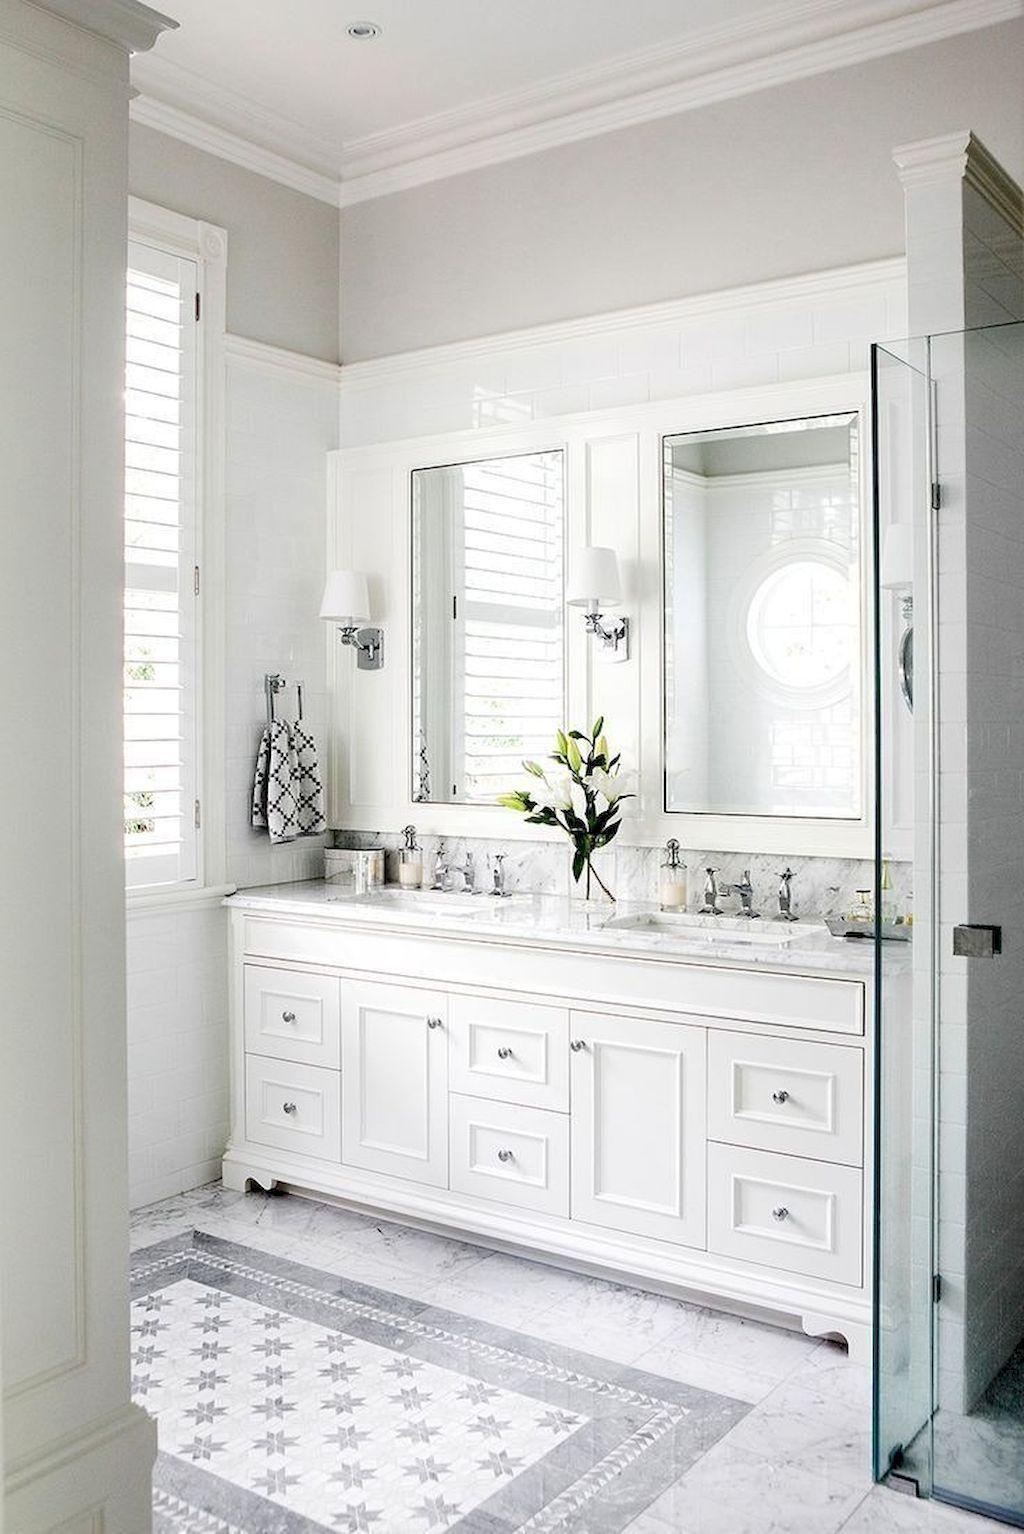 Master bedroom ensuite ideas  Beautiful Master Bathroom Remodel Ideas   Master bathrooms Bath